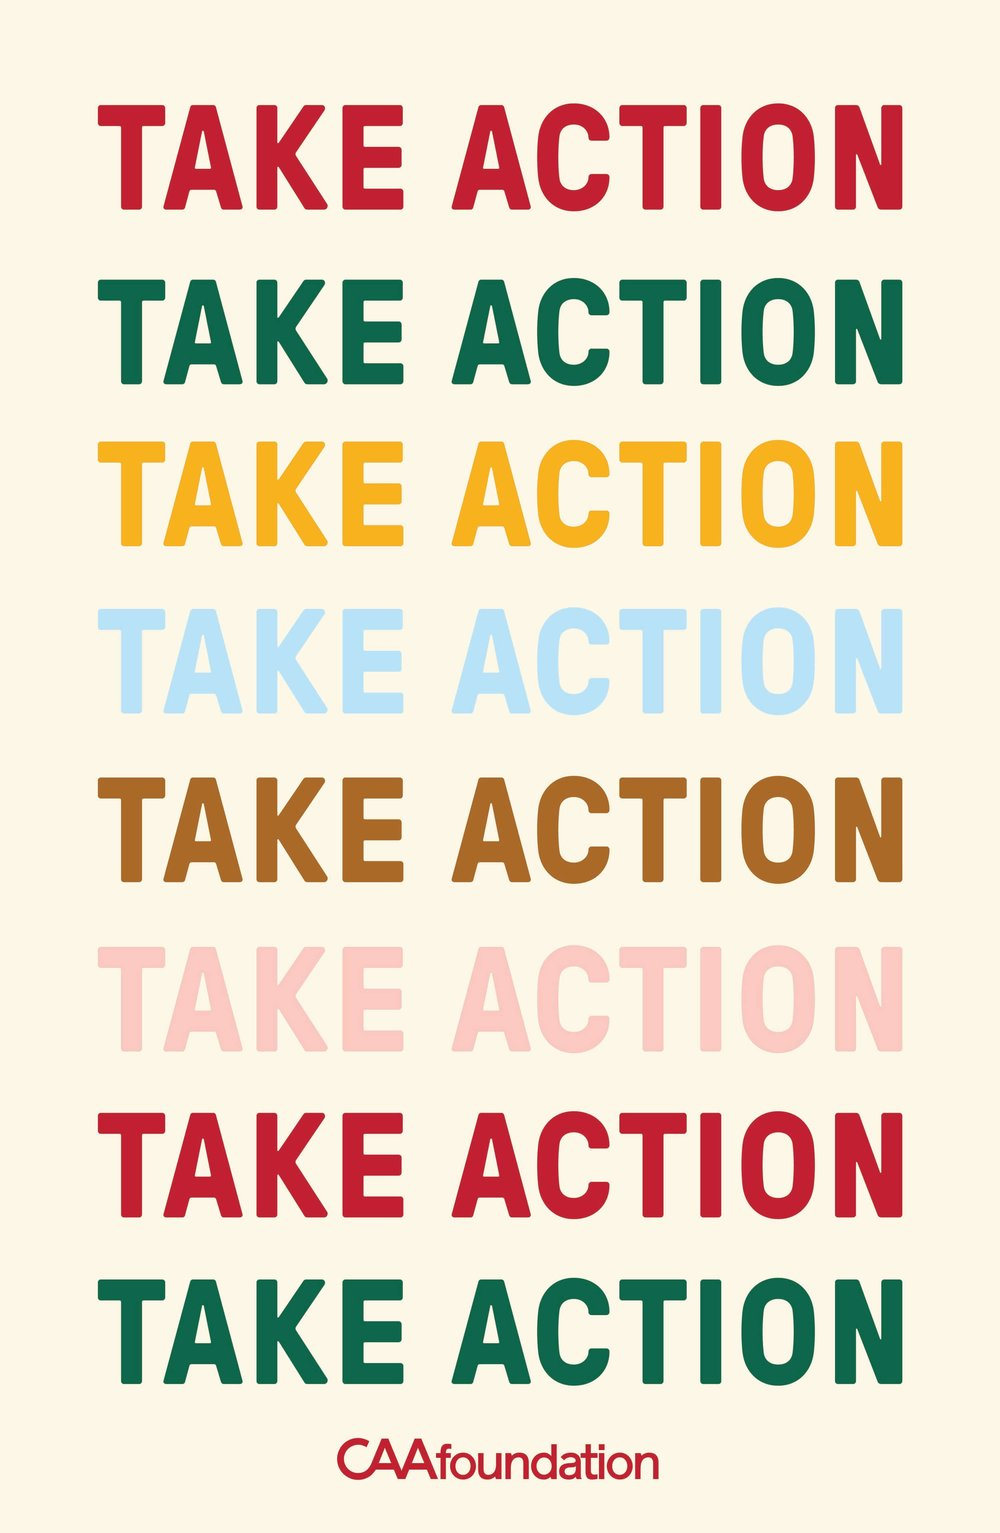 Take_Action_Posters_v5-05.jpg